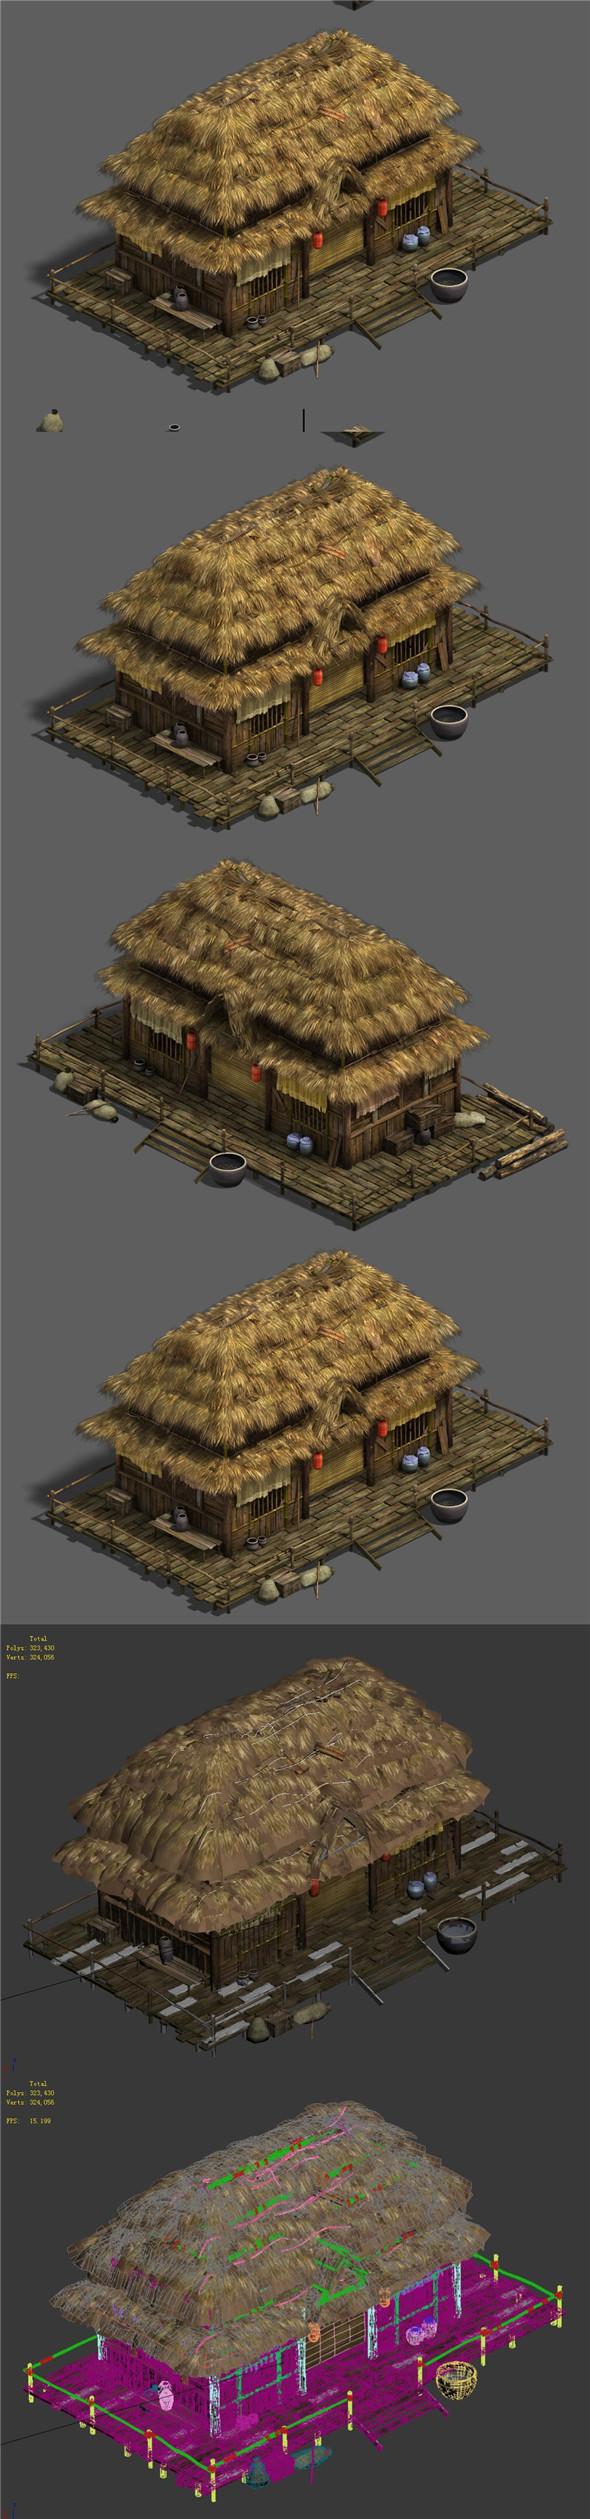 Original Village - House 3 - 3DOcean Item for Sale